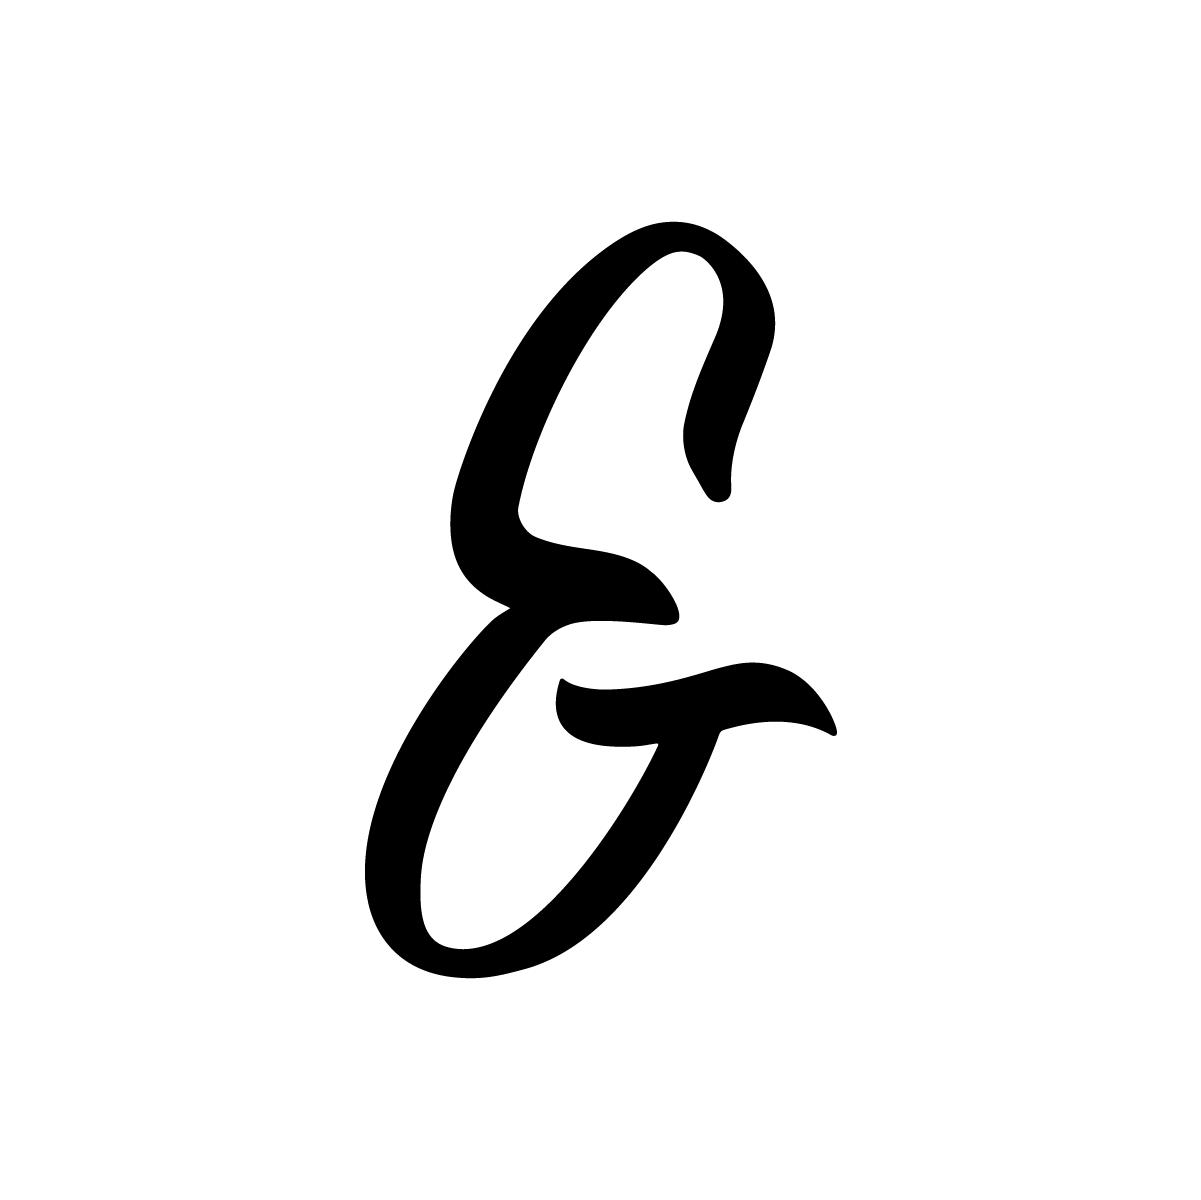 Ampersand_FNL-04.png